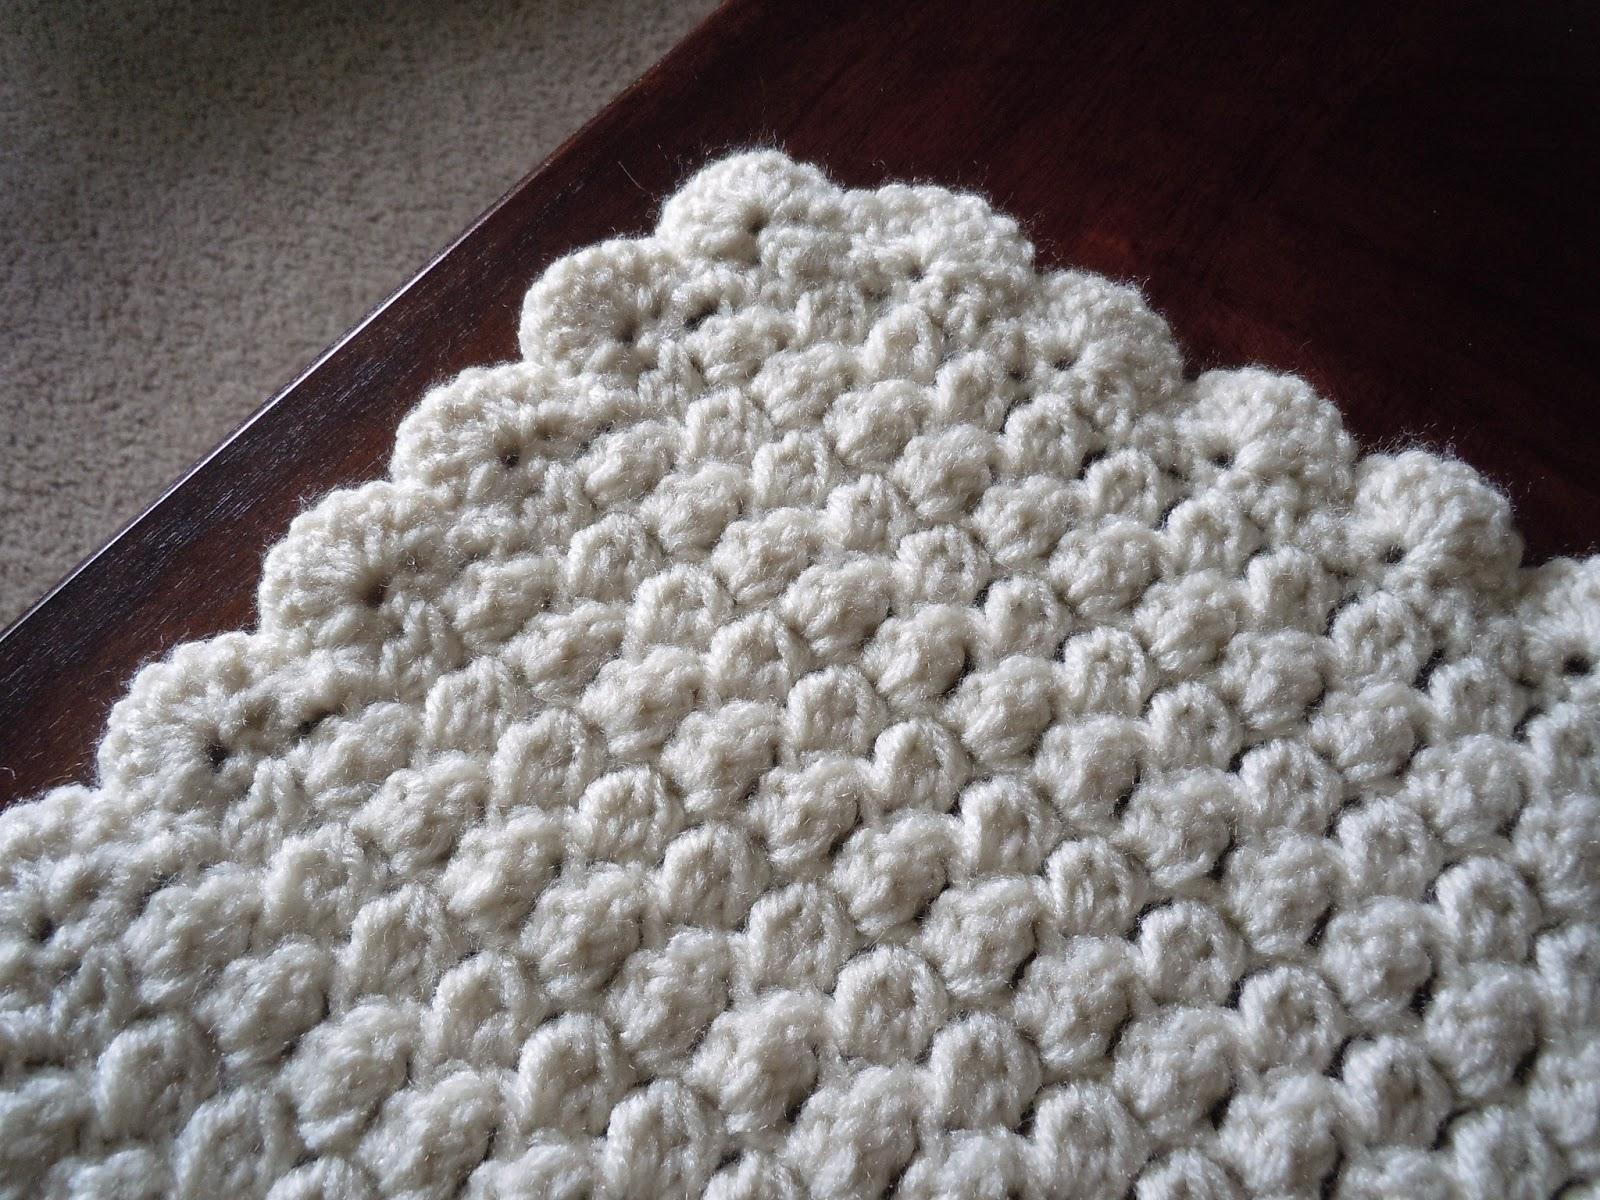 Crochet Caterpillar Baby Blanket Pattern : Illuminate Crochet: June 2013